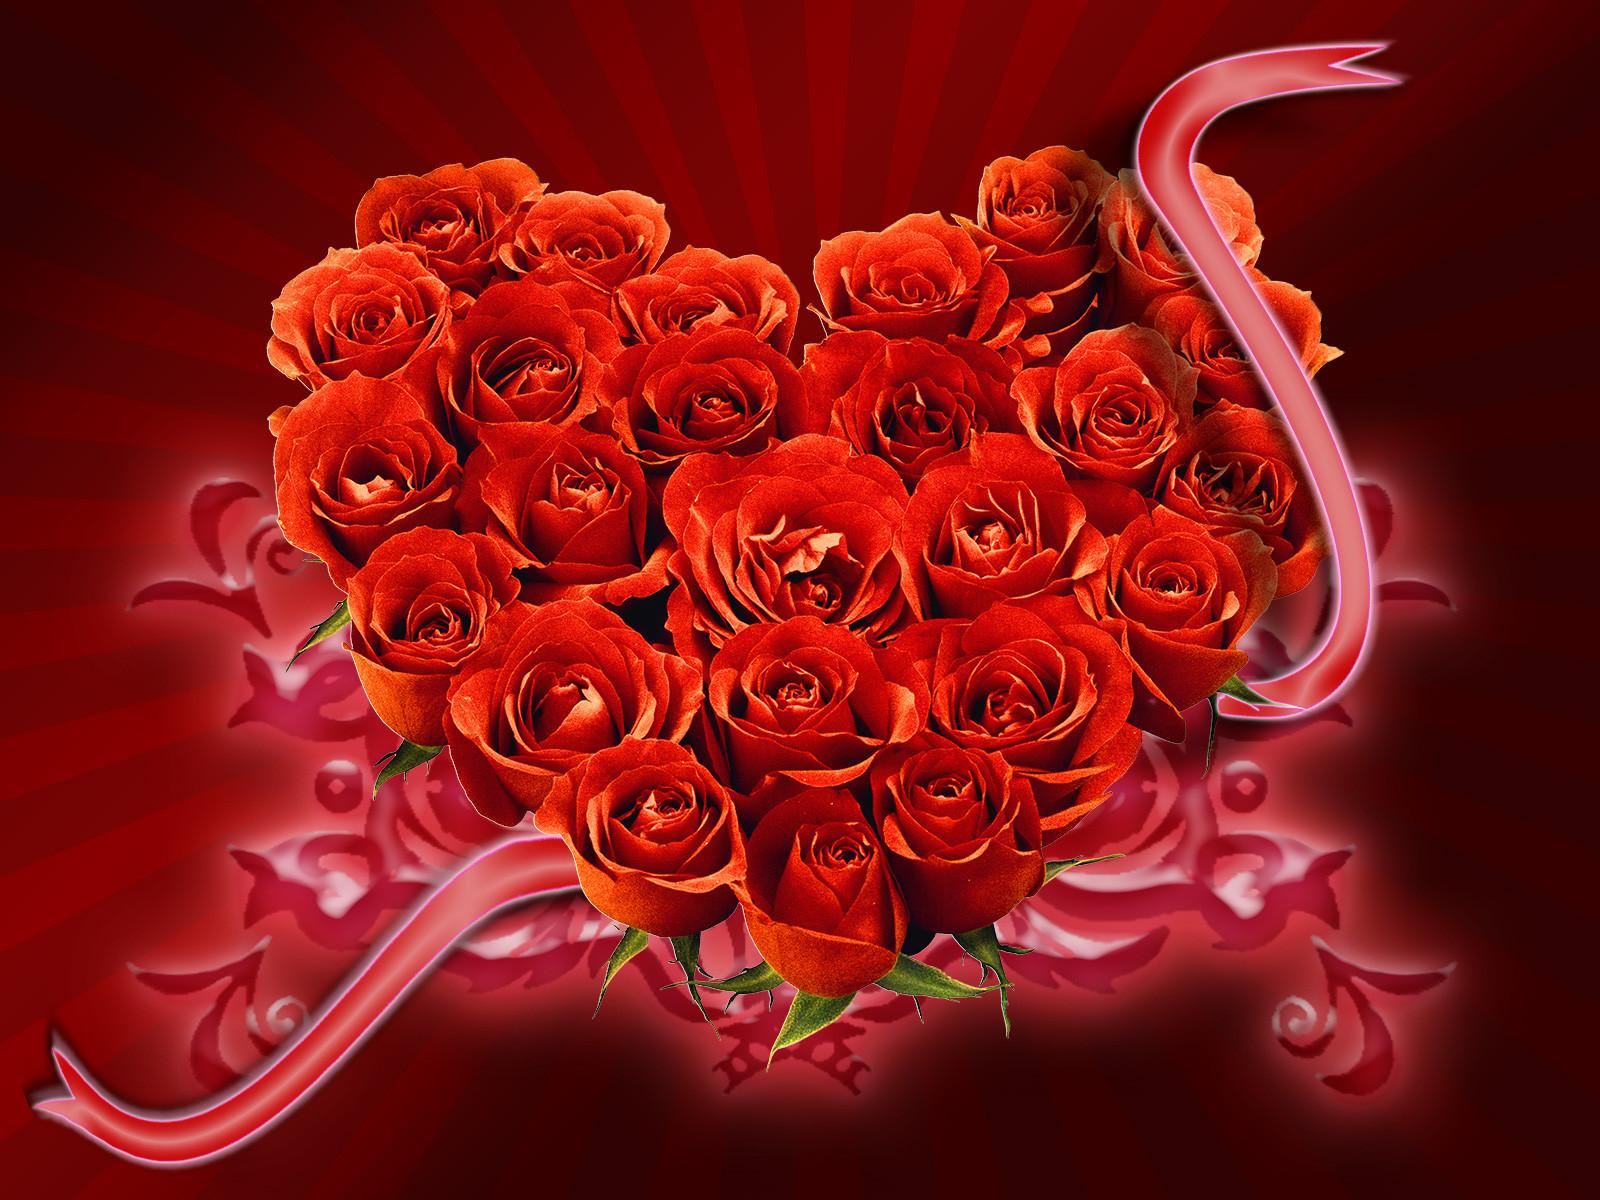 http://kachestvo.by/wp-content/uploads/2013/05/00168.jpg